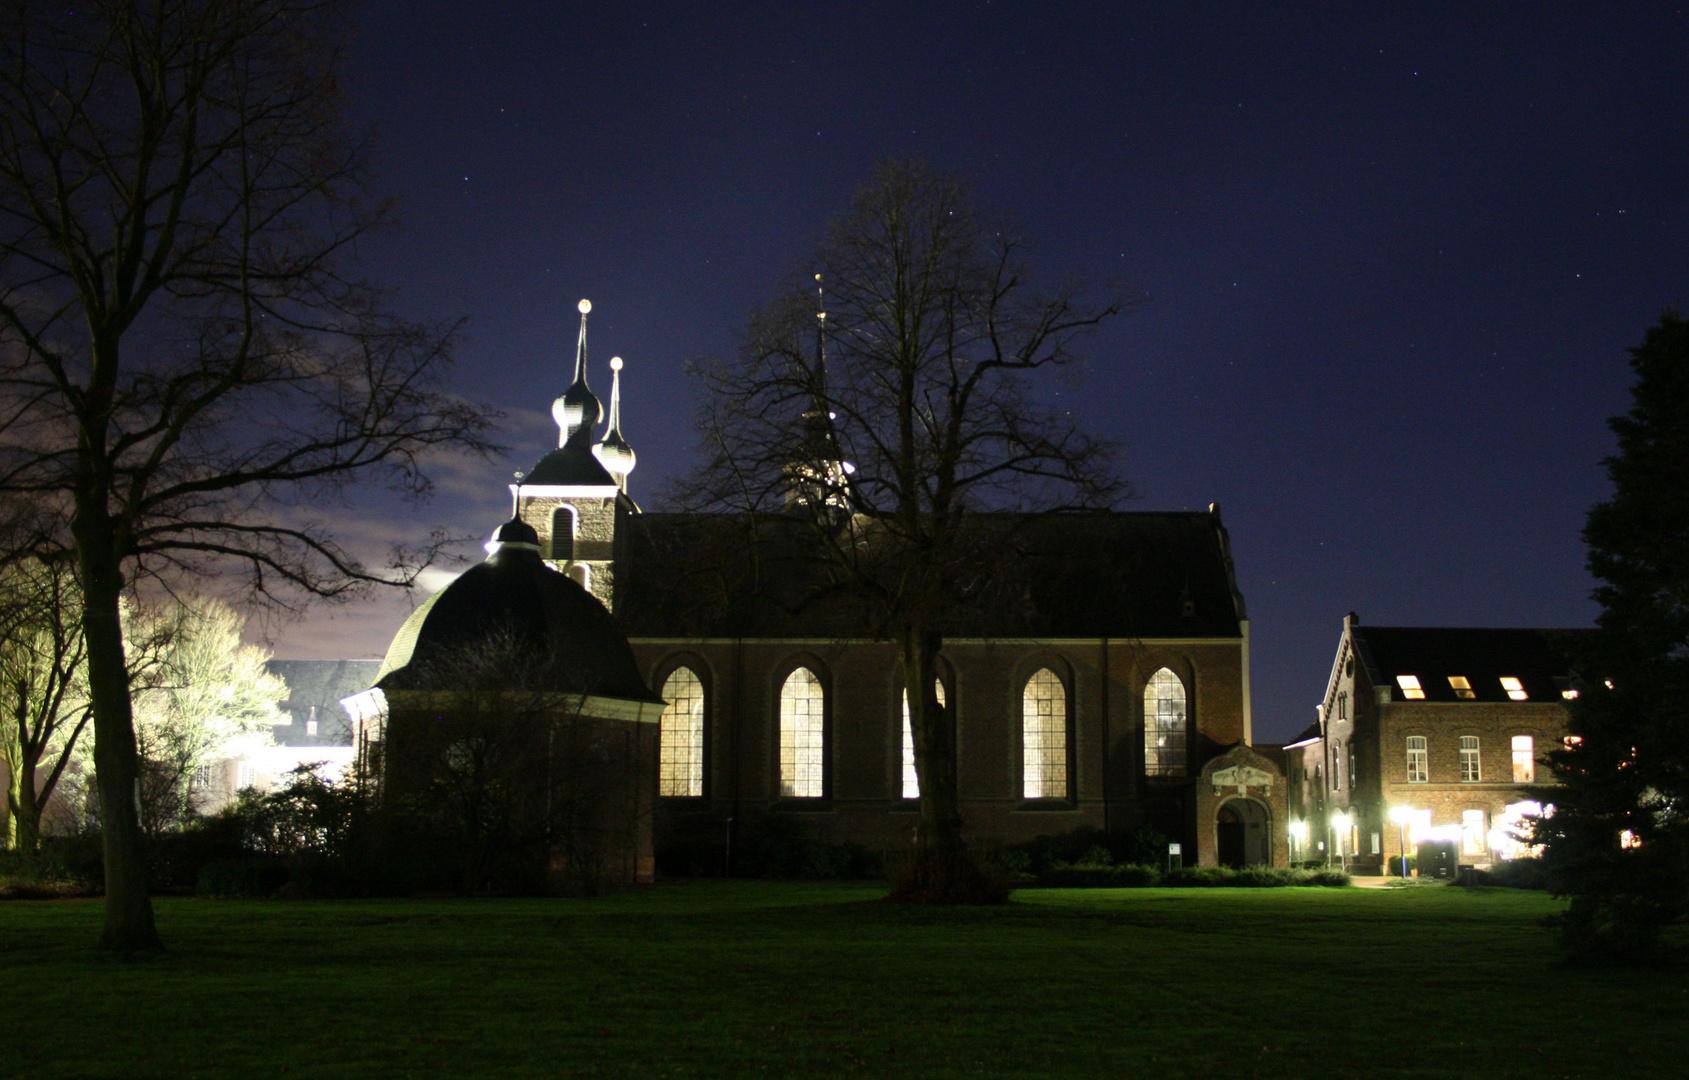 Kloster Kamp bei Nacht